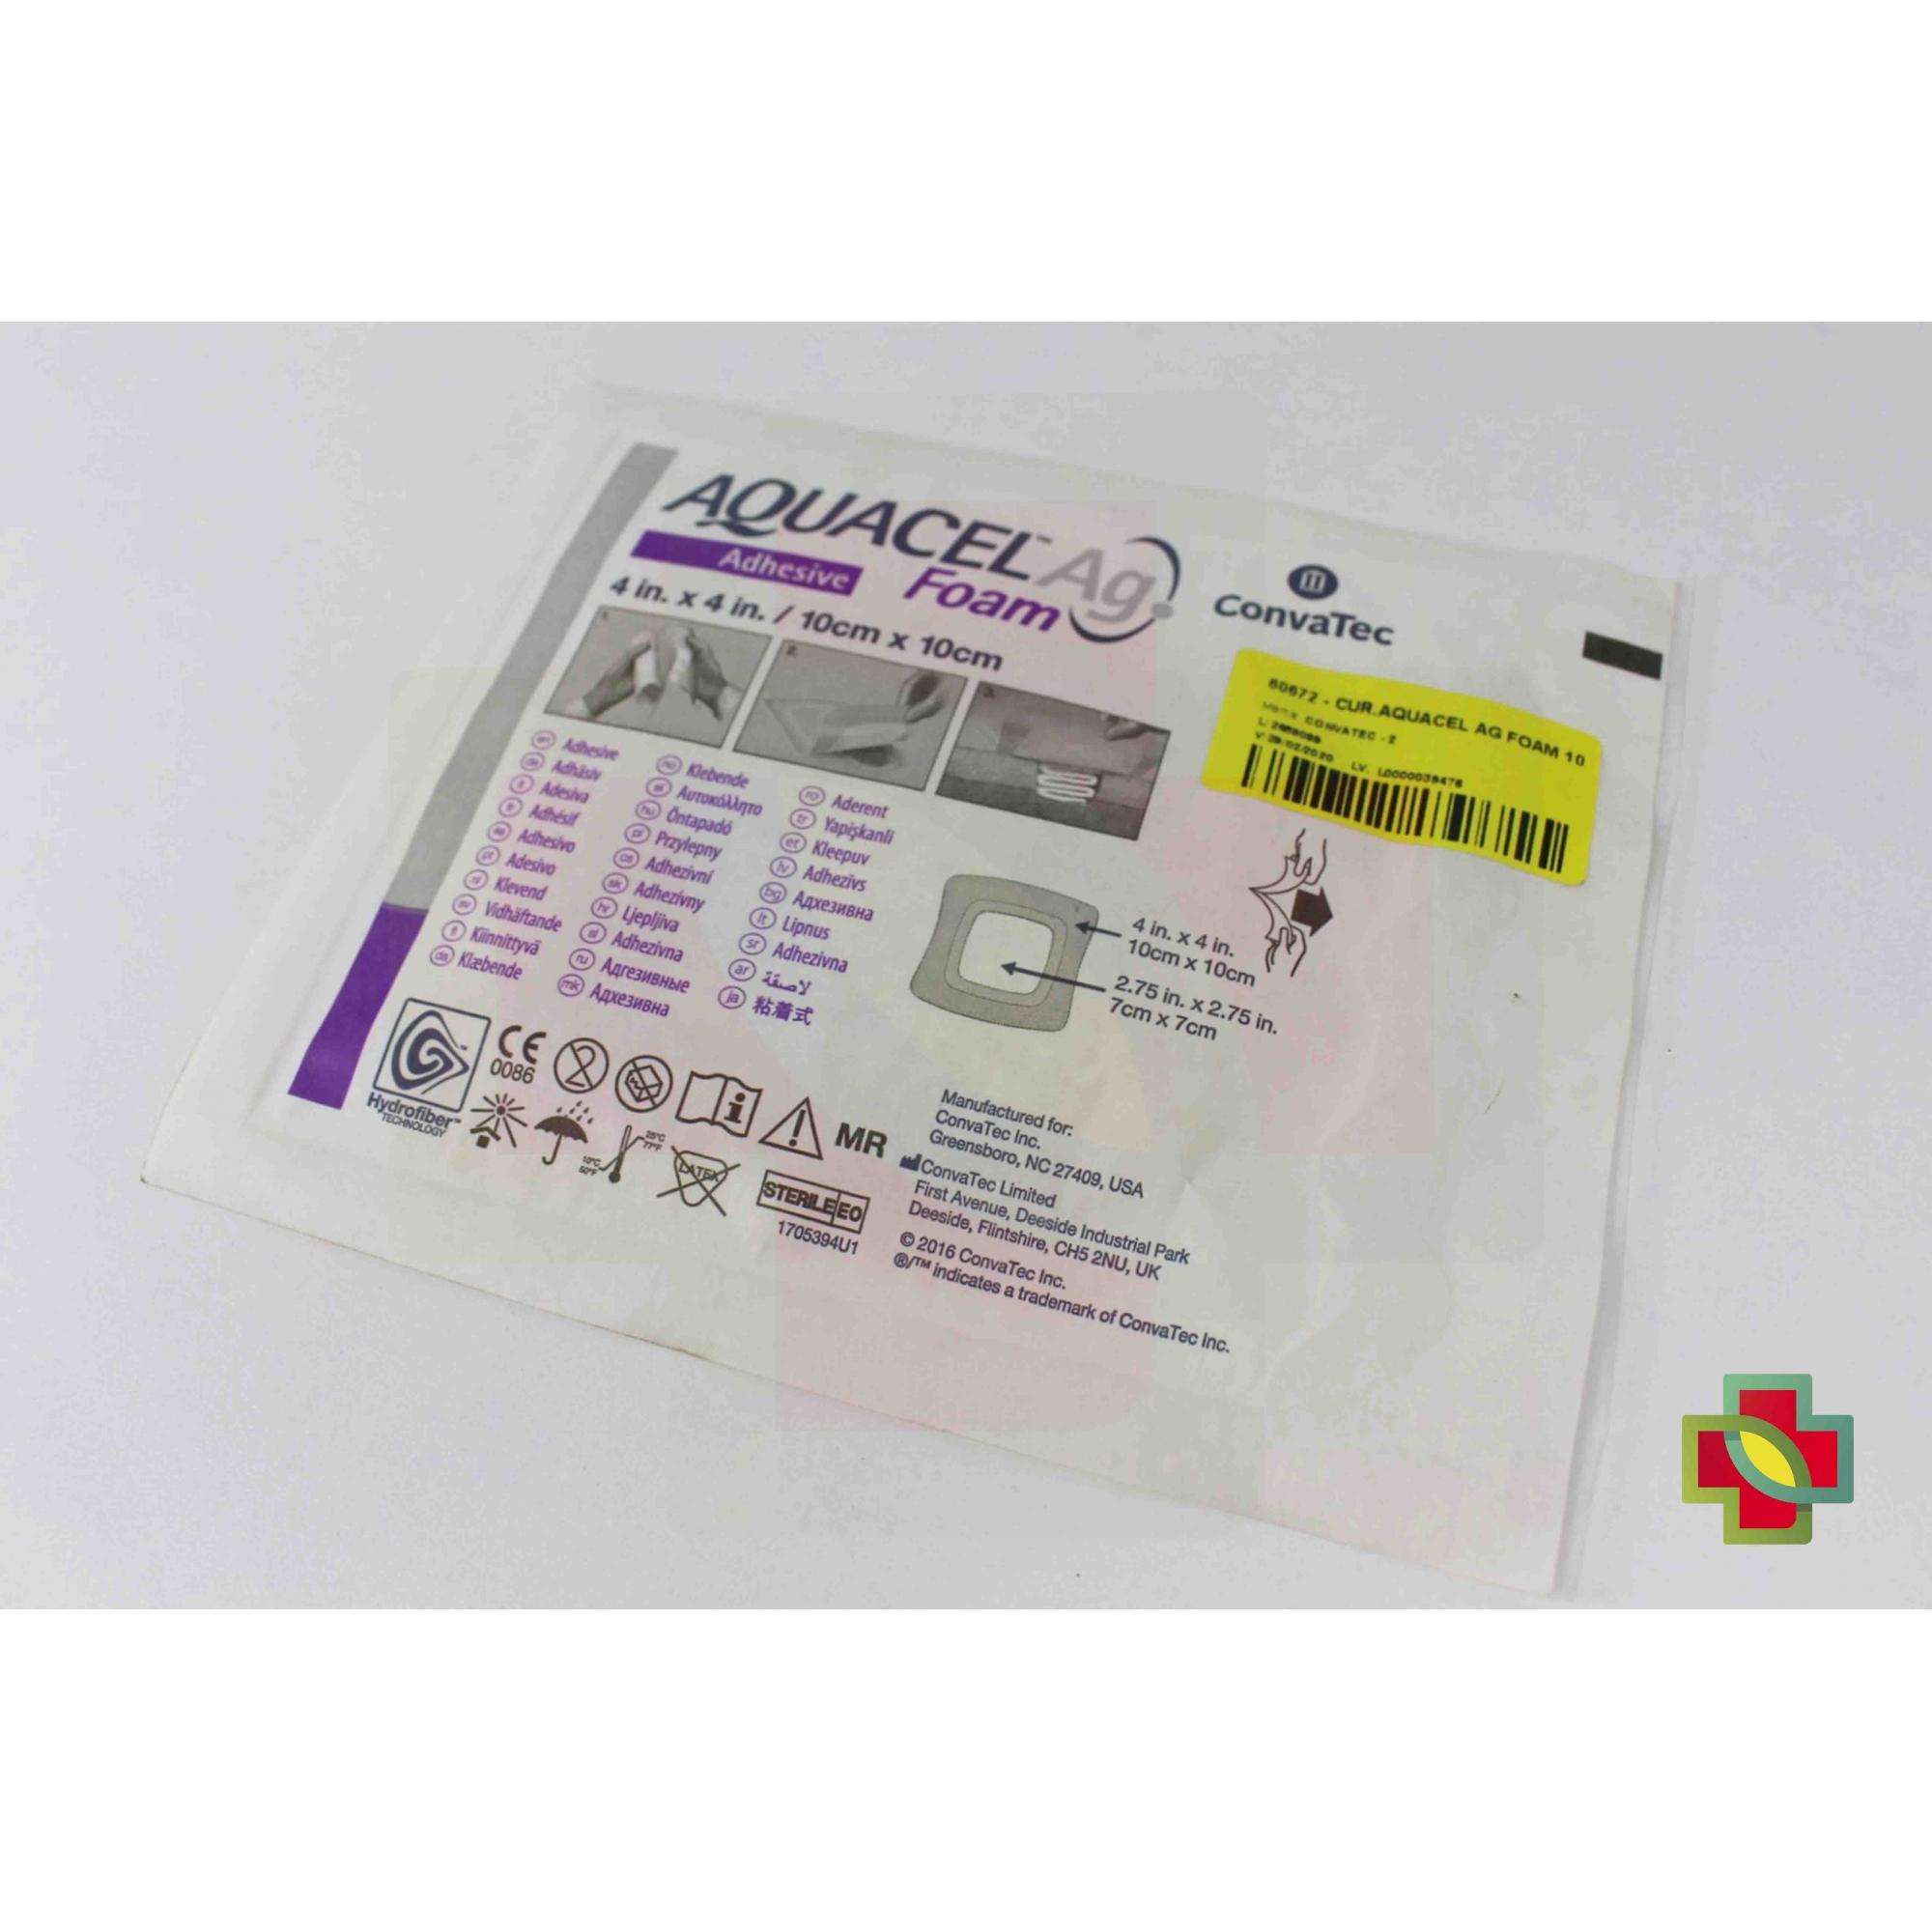 CURATIVO AQUACEL AG FOAM ADESIVO 10 X 10  (CX C/10 UND) 420681 - CONVATEC